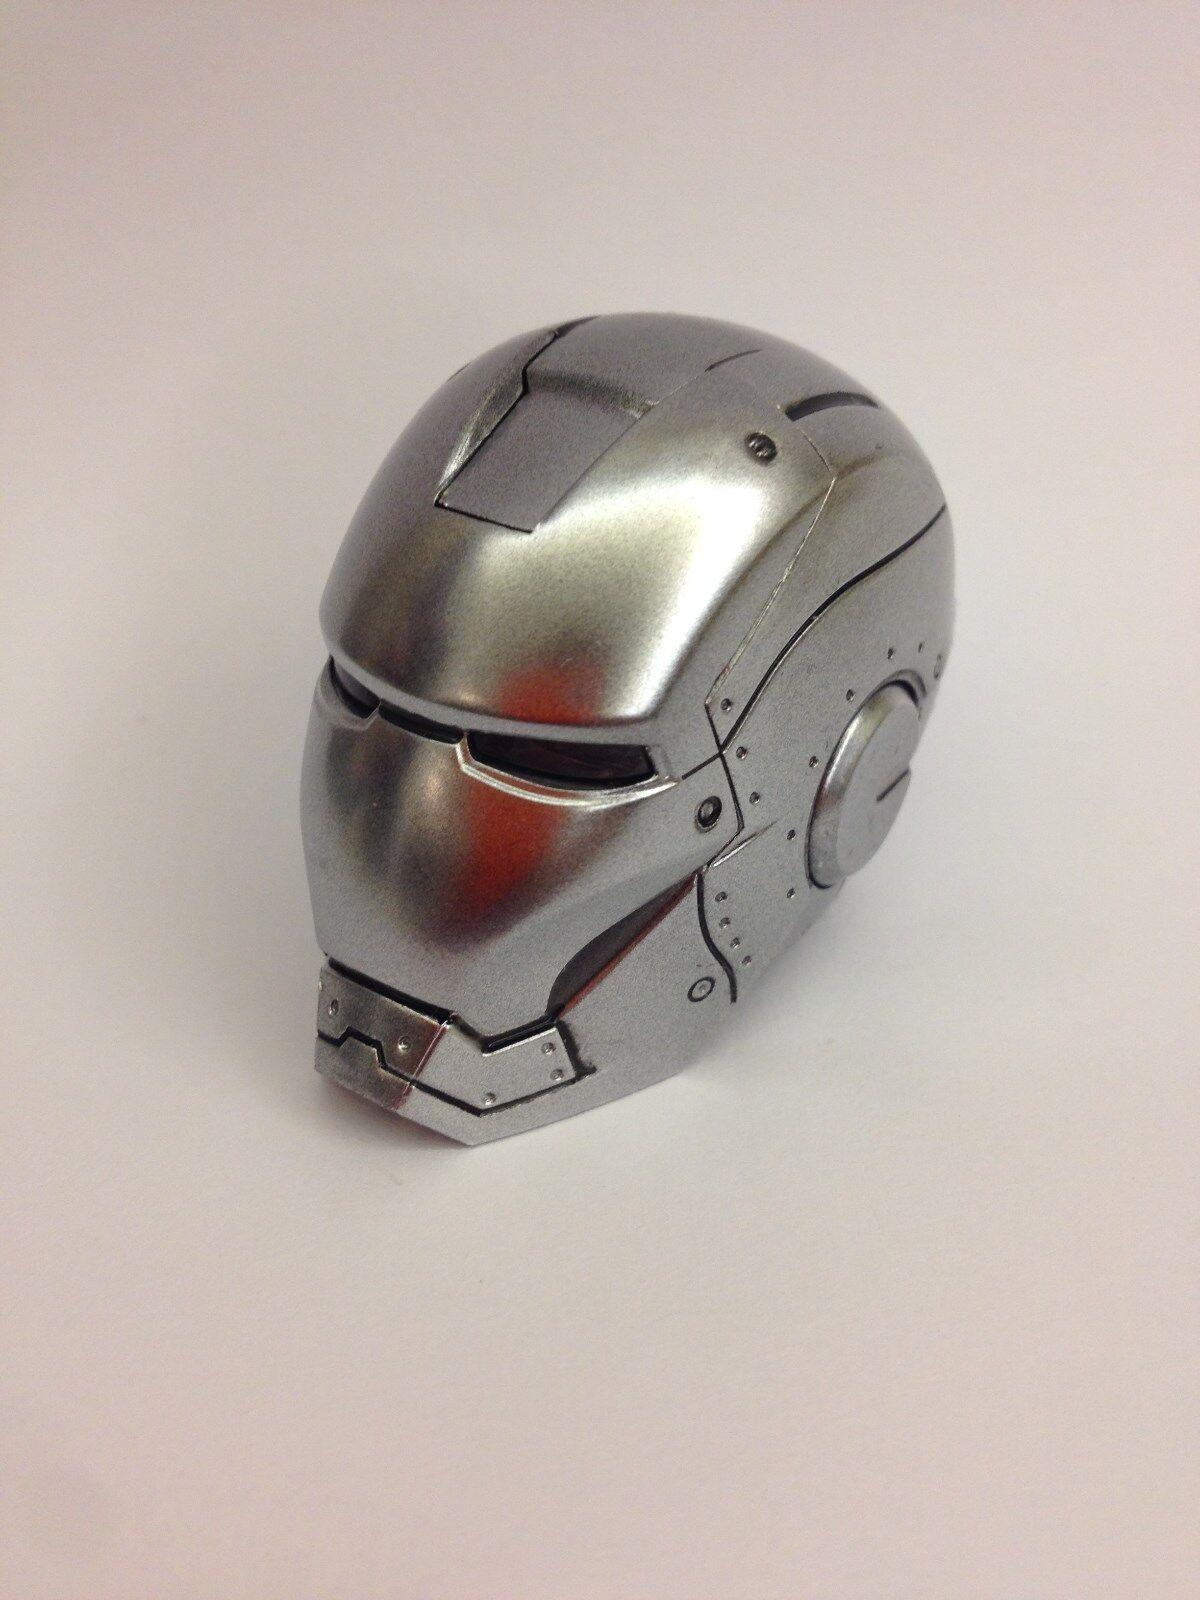 Hot Toys Iron Man MARK II 2 Armor Unleashed Figure 1 6 HEAD SCULPT for light up